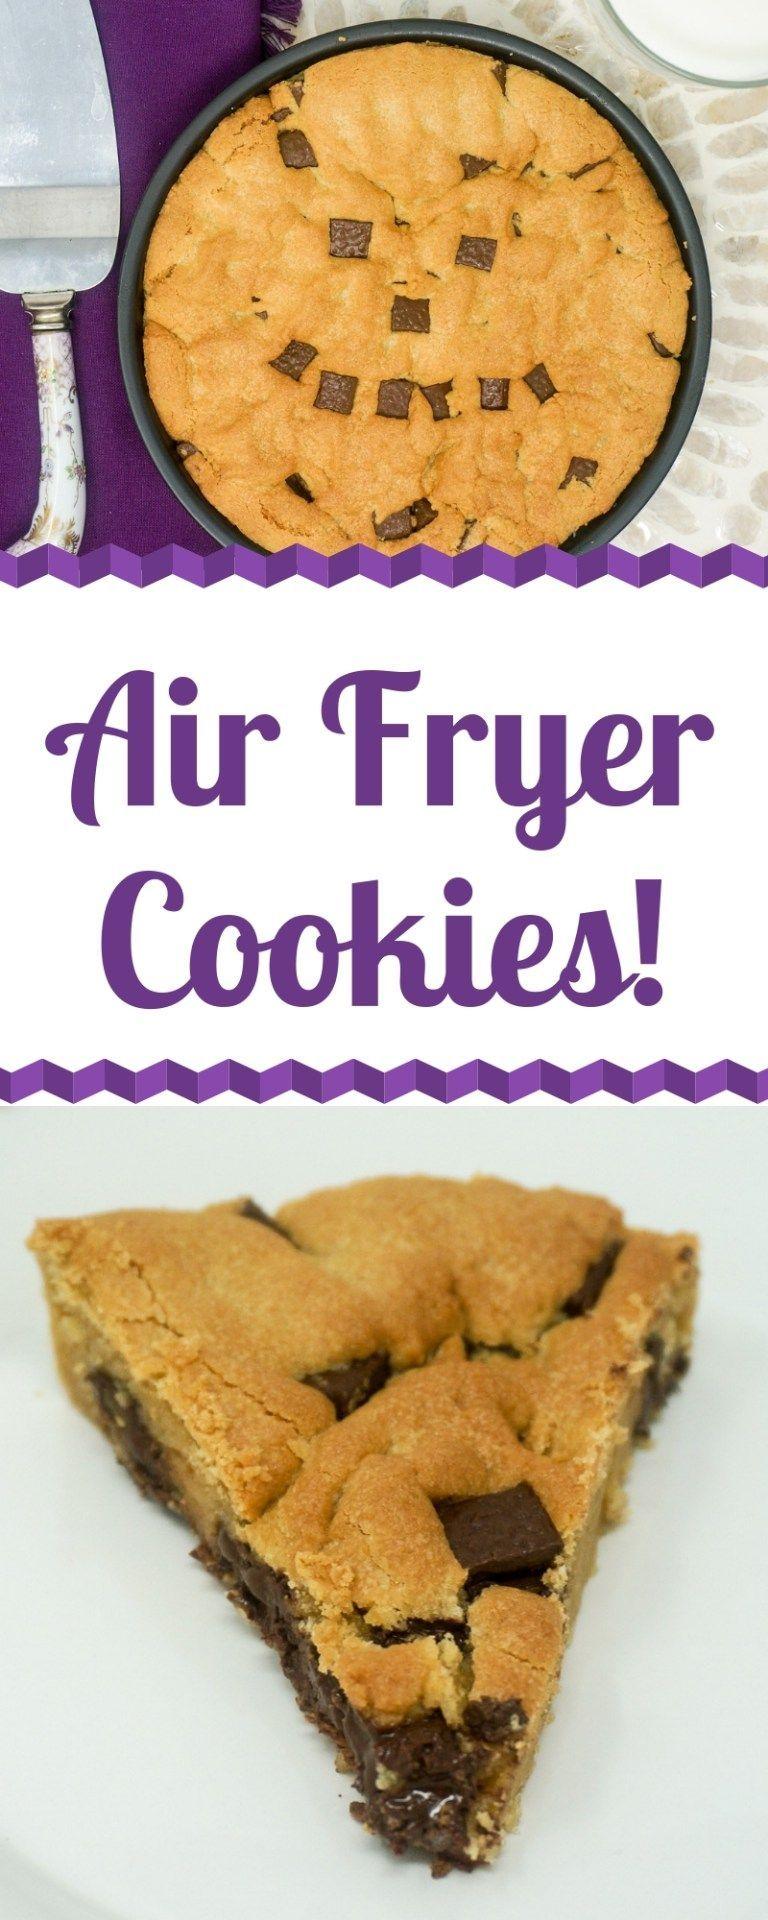 Air Fryer Cookies chocolatefonduerecipe Air fryer